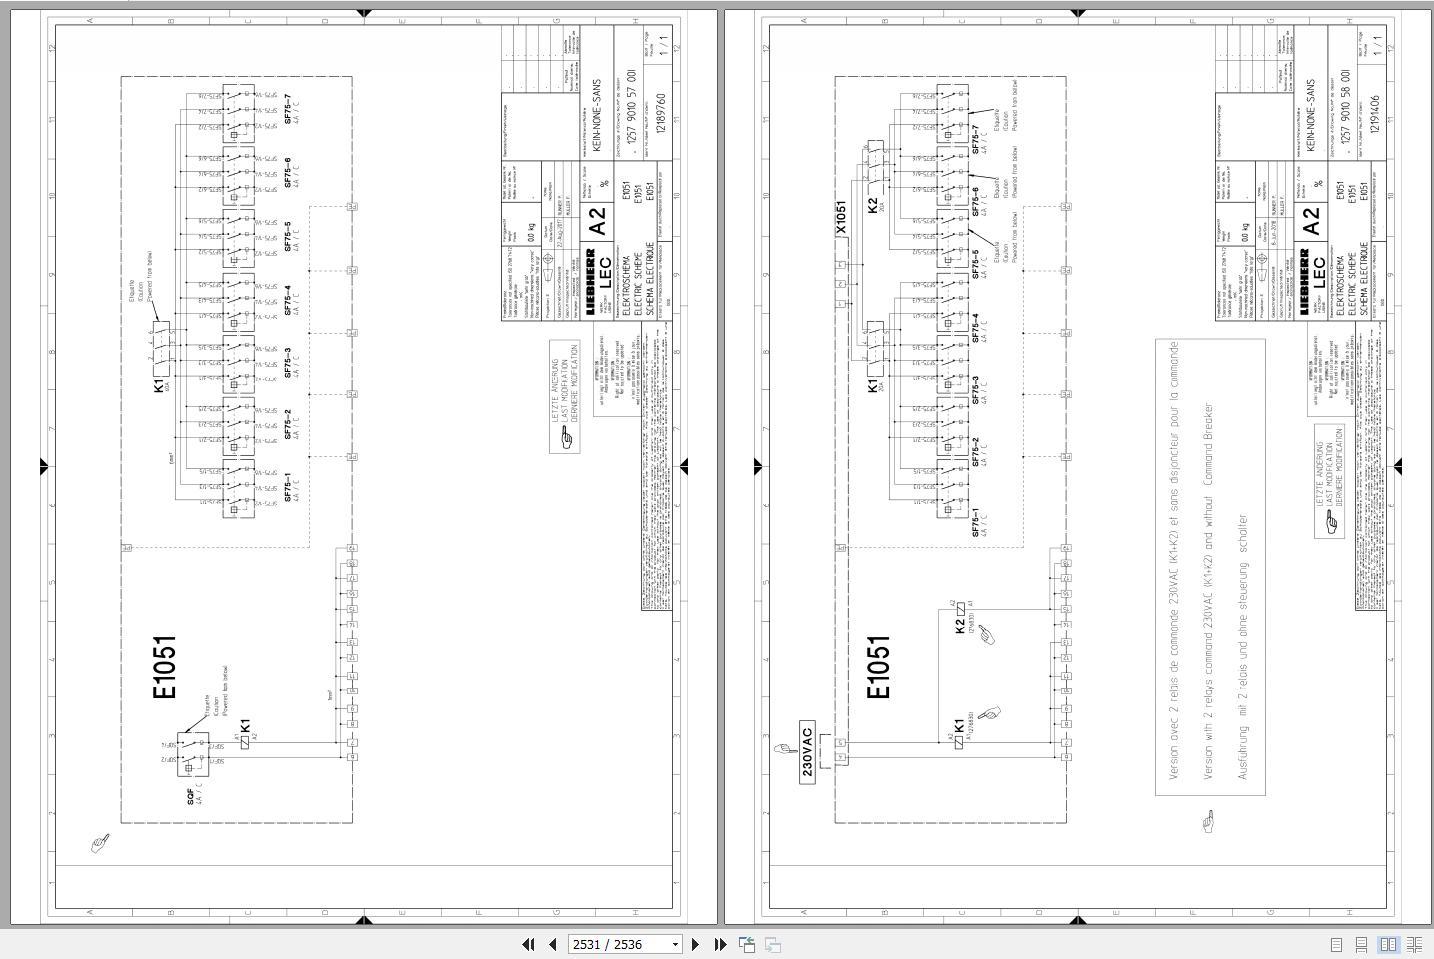 Liebherr_Mining_Excavators_Service_Manual_New_Updated_032020_31